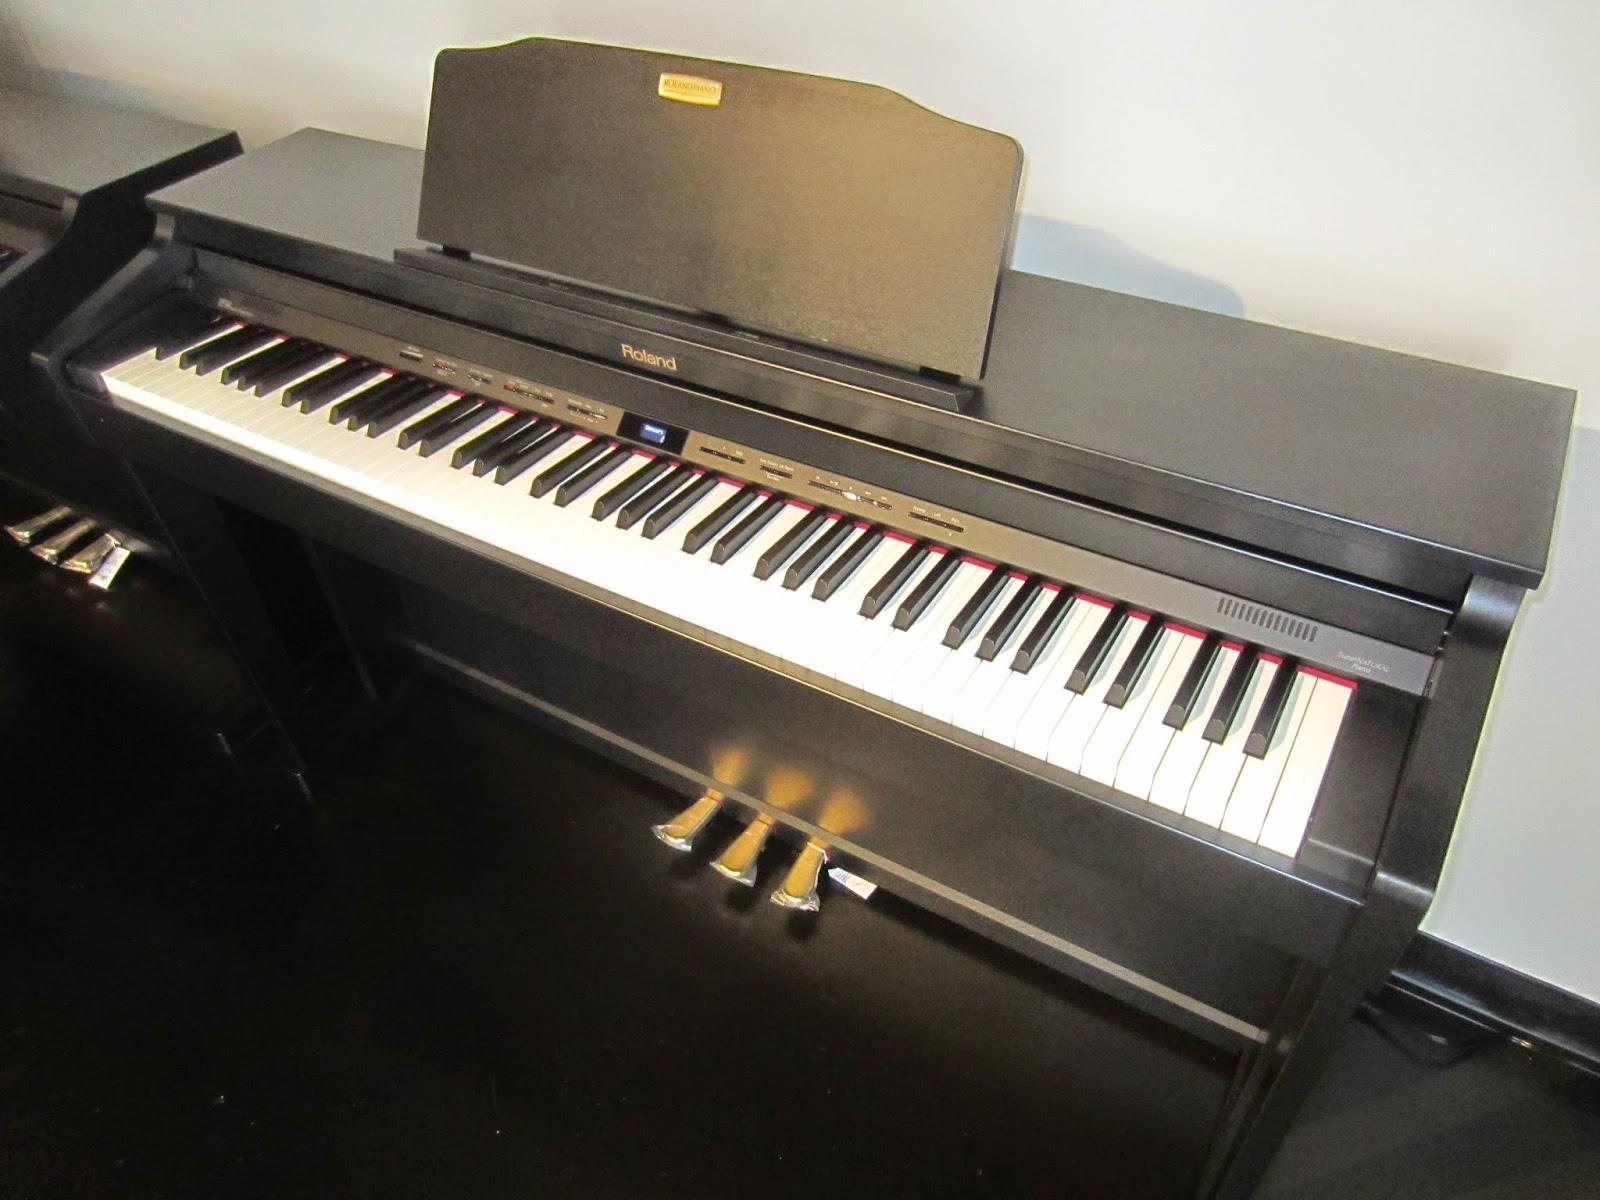 Roland HP504, HP506, HP508 digital pianos